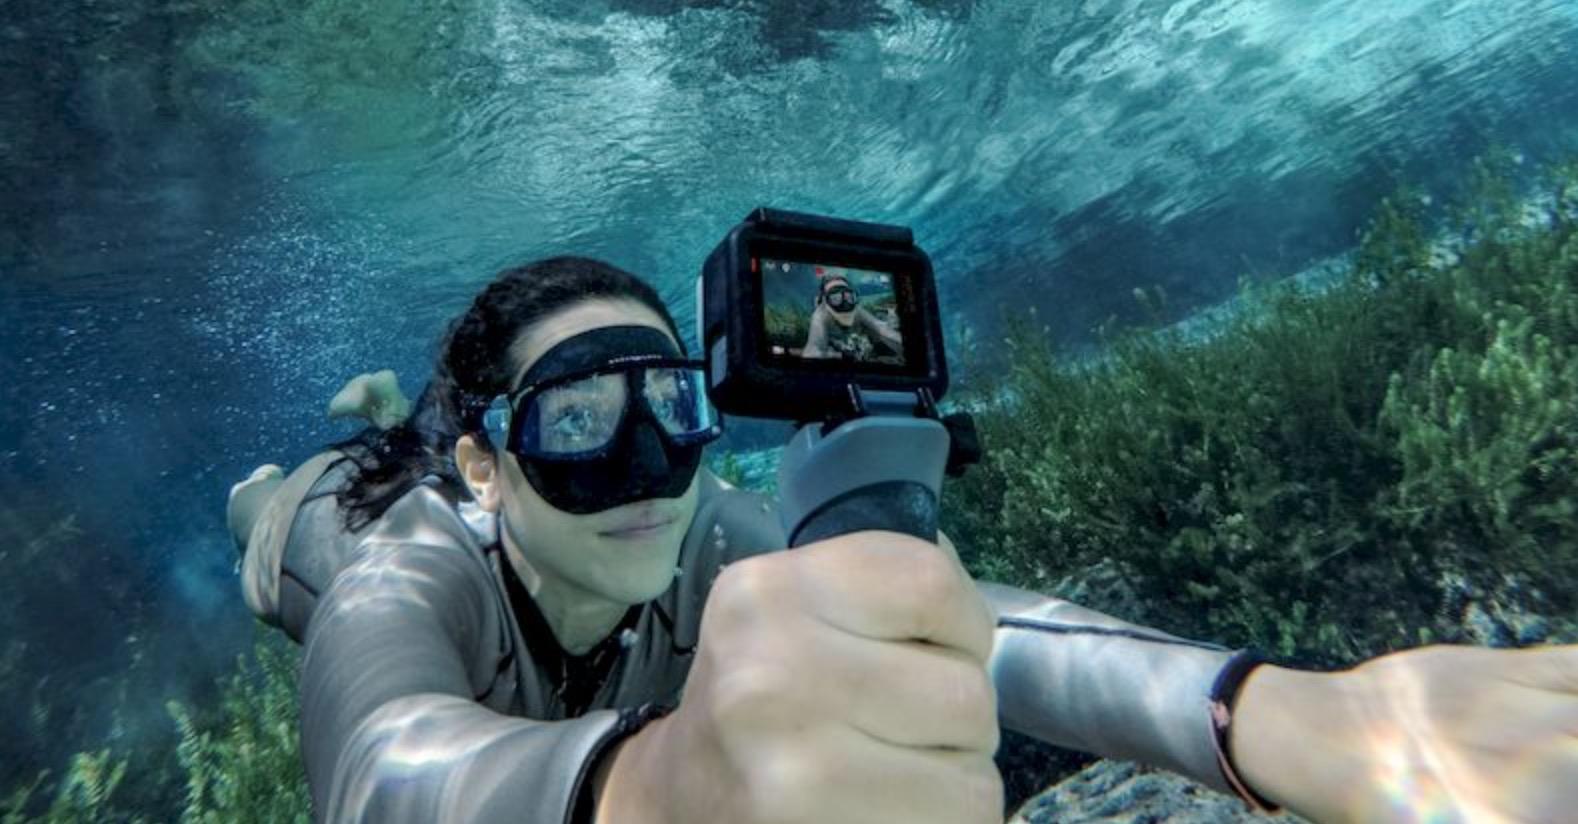 Hero 6 Black action cam GoPro